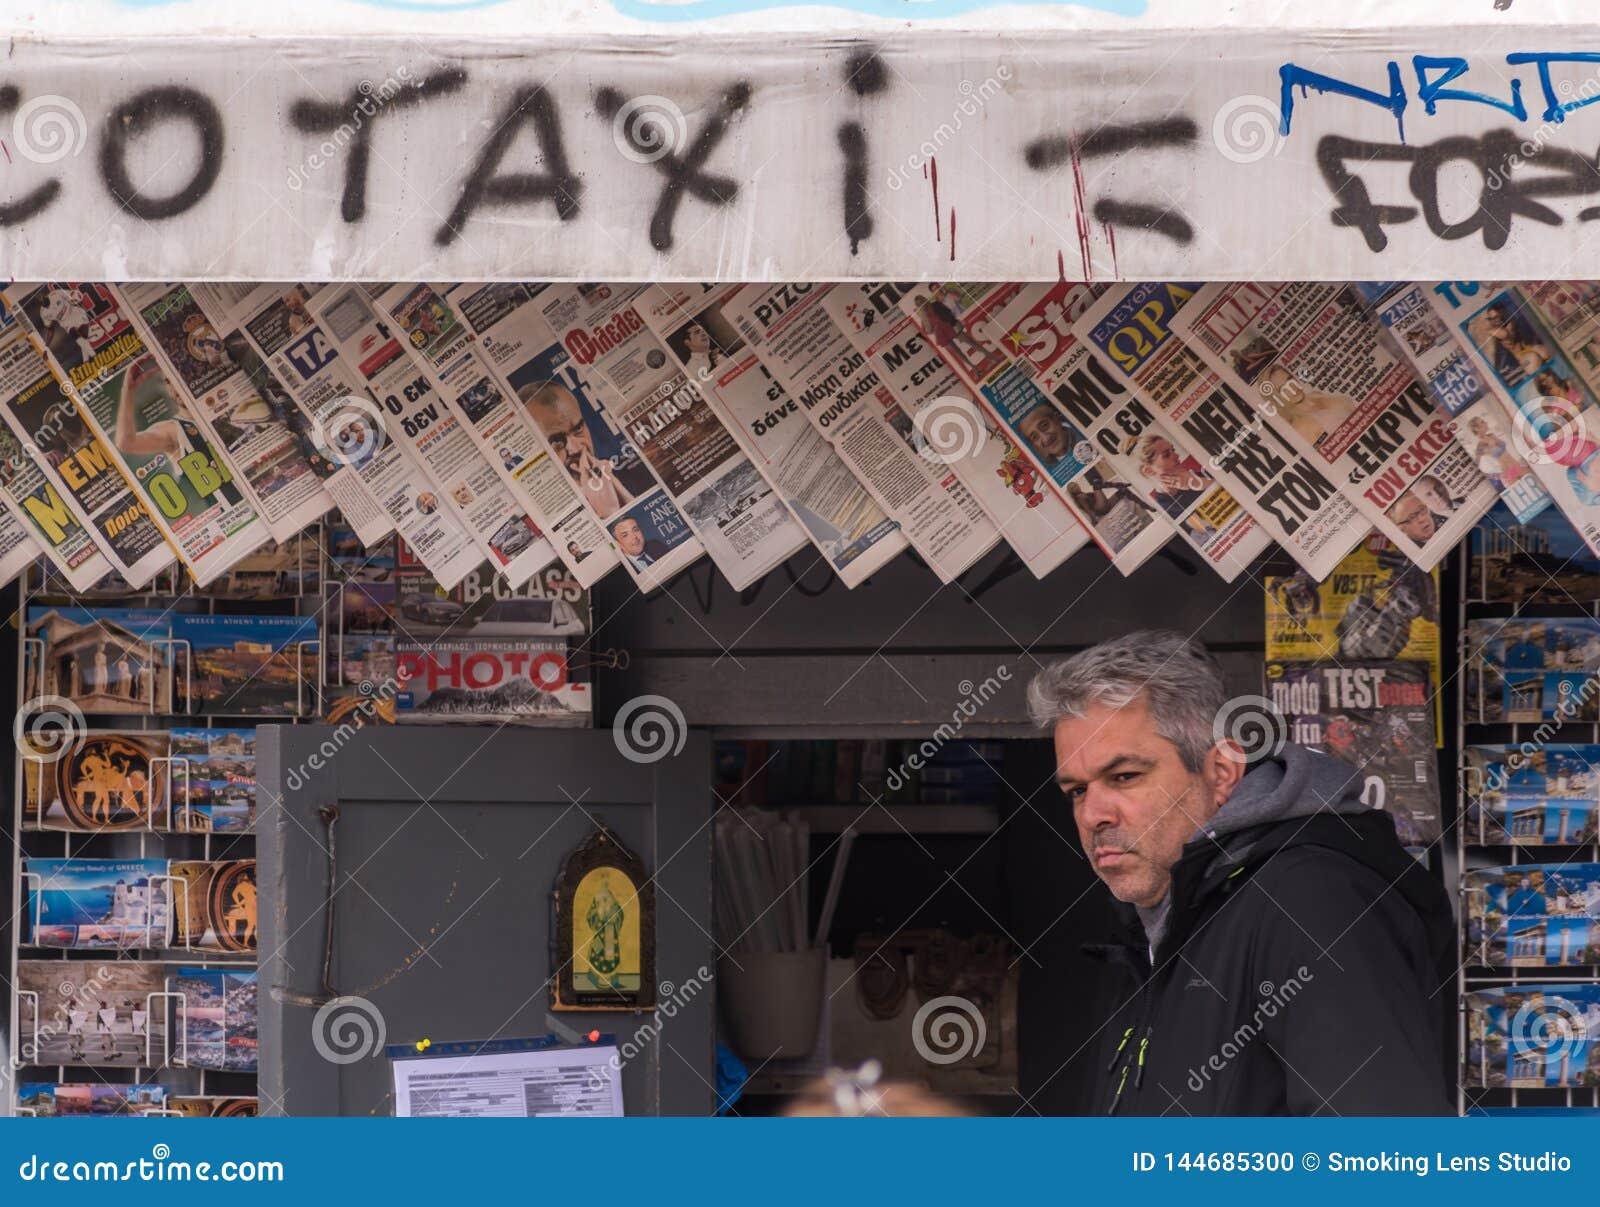 Newspaper stand, Monastiraki, Atyhens, Greece